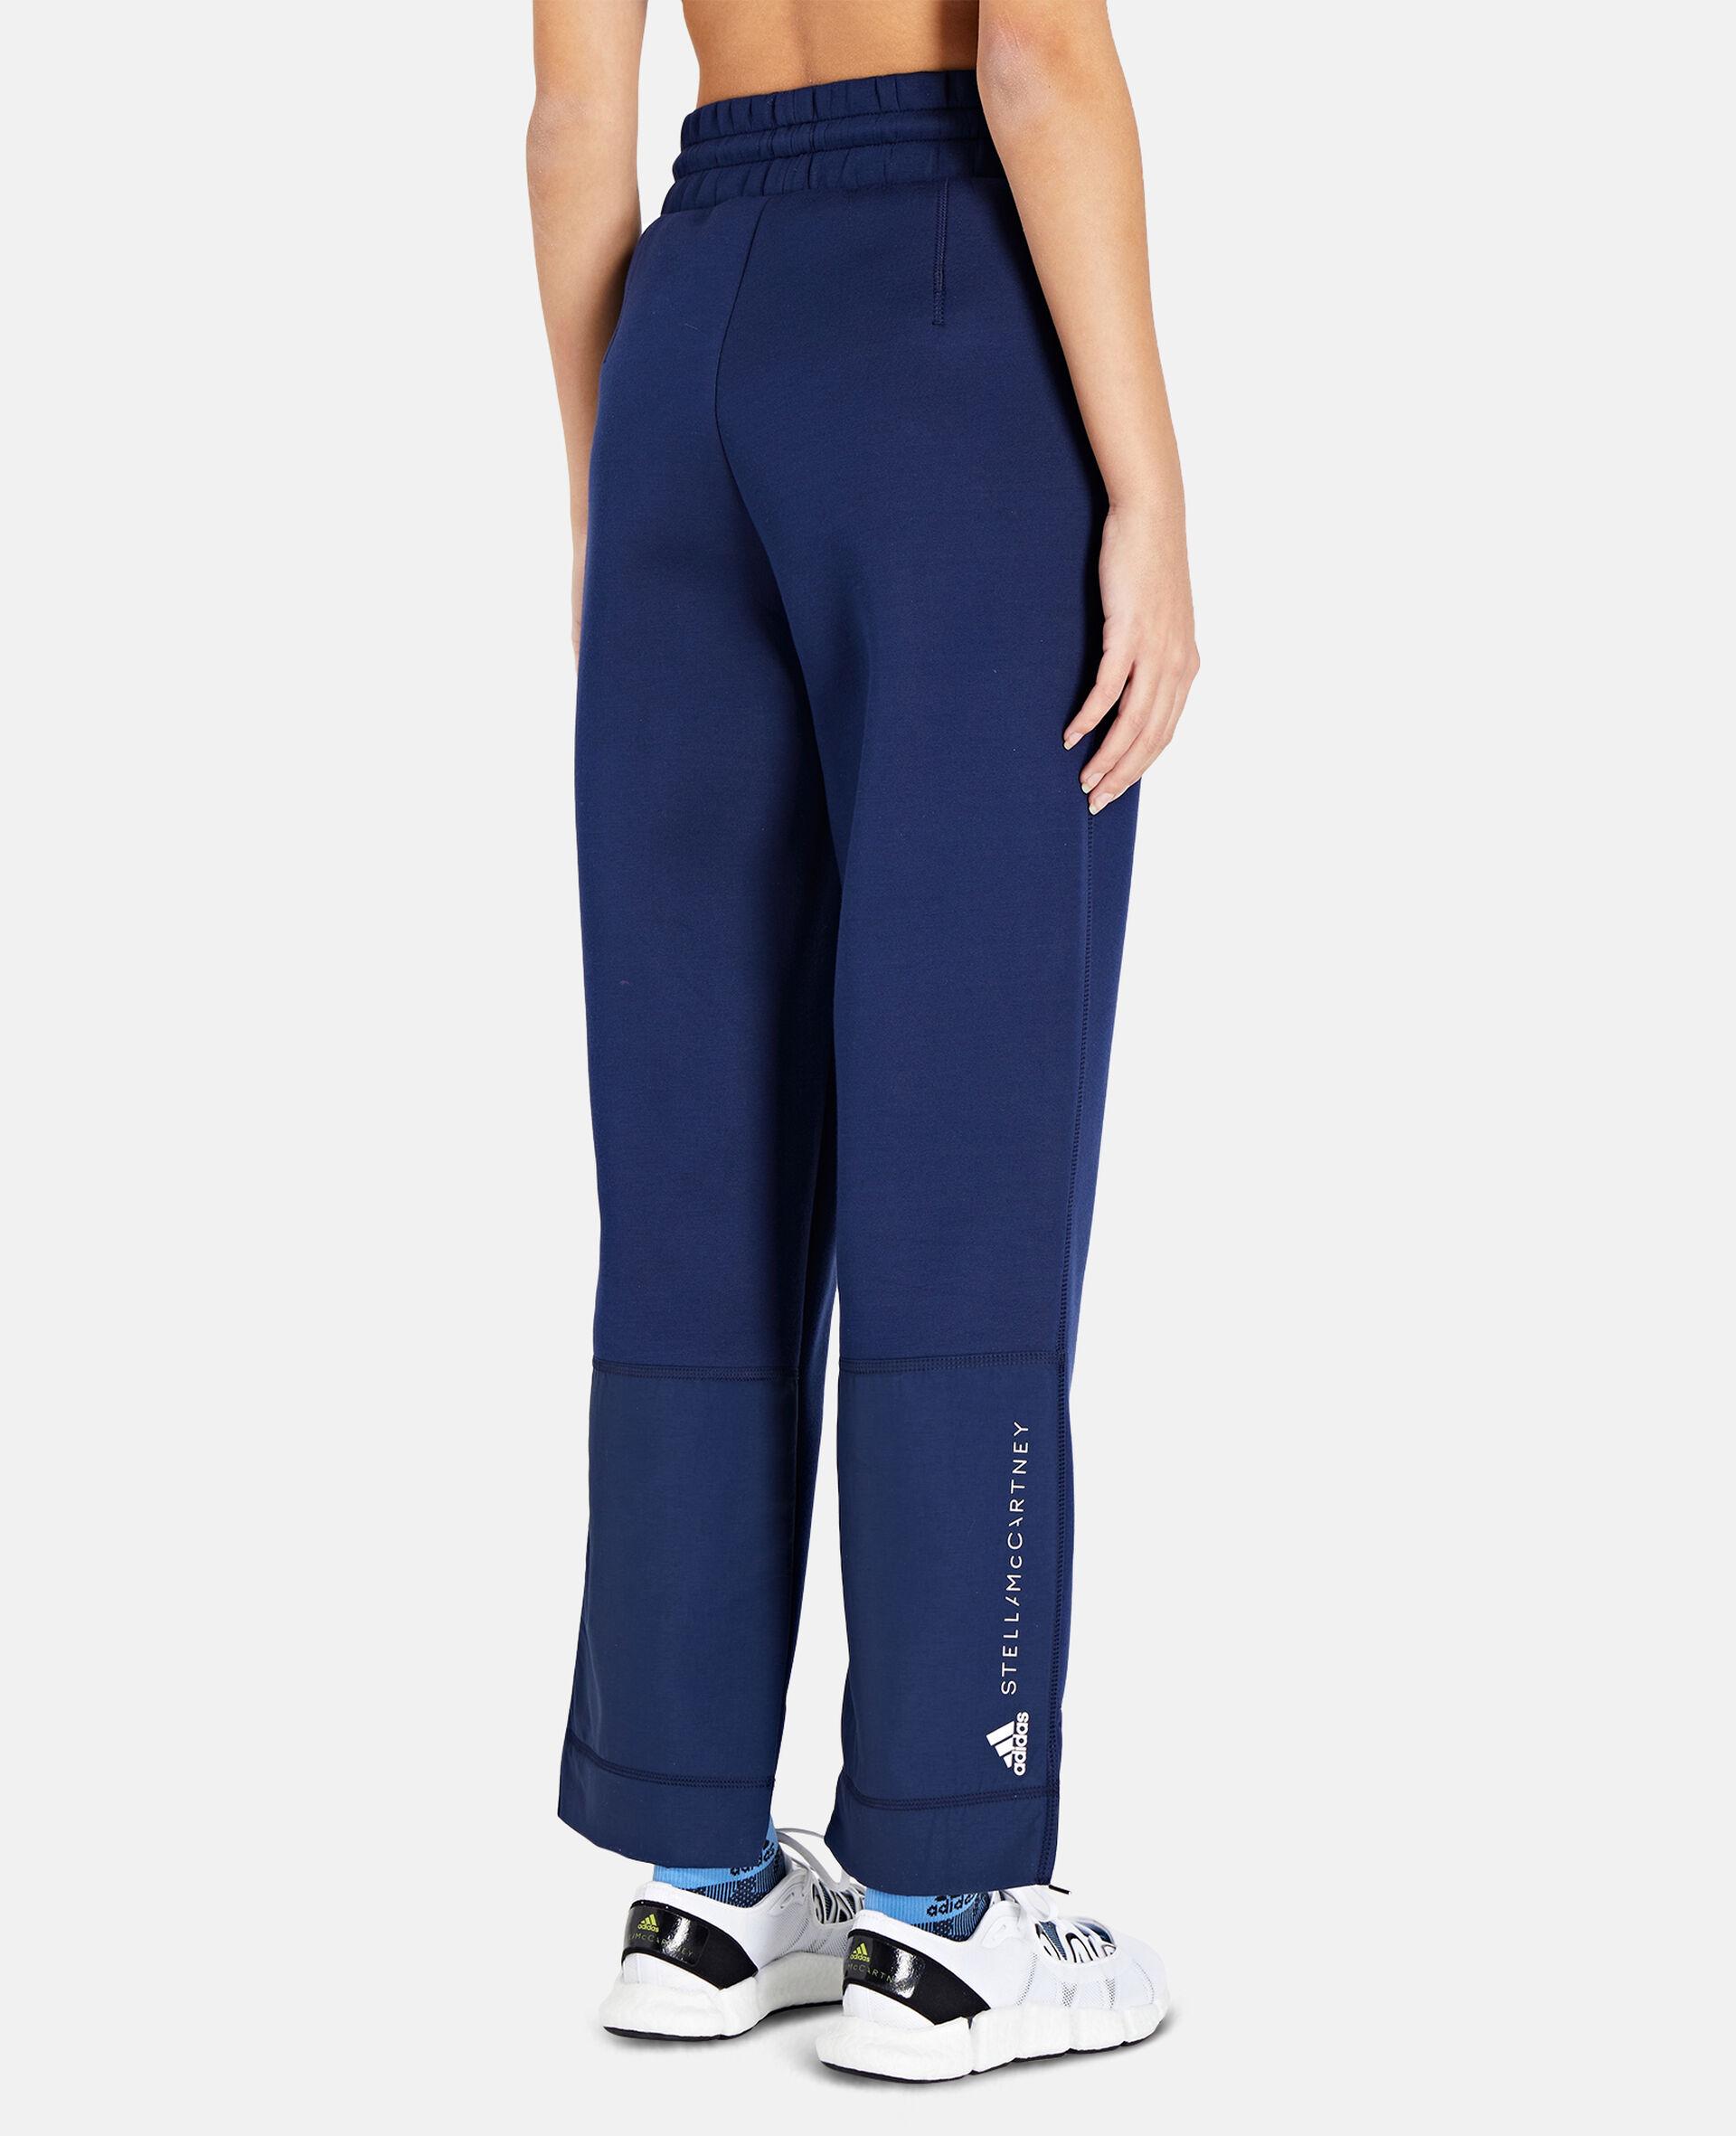 Blue Tapered Sweatpants-Blue-large image number 2